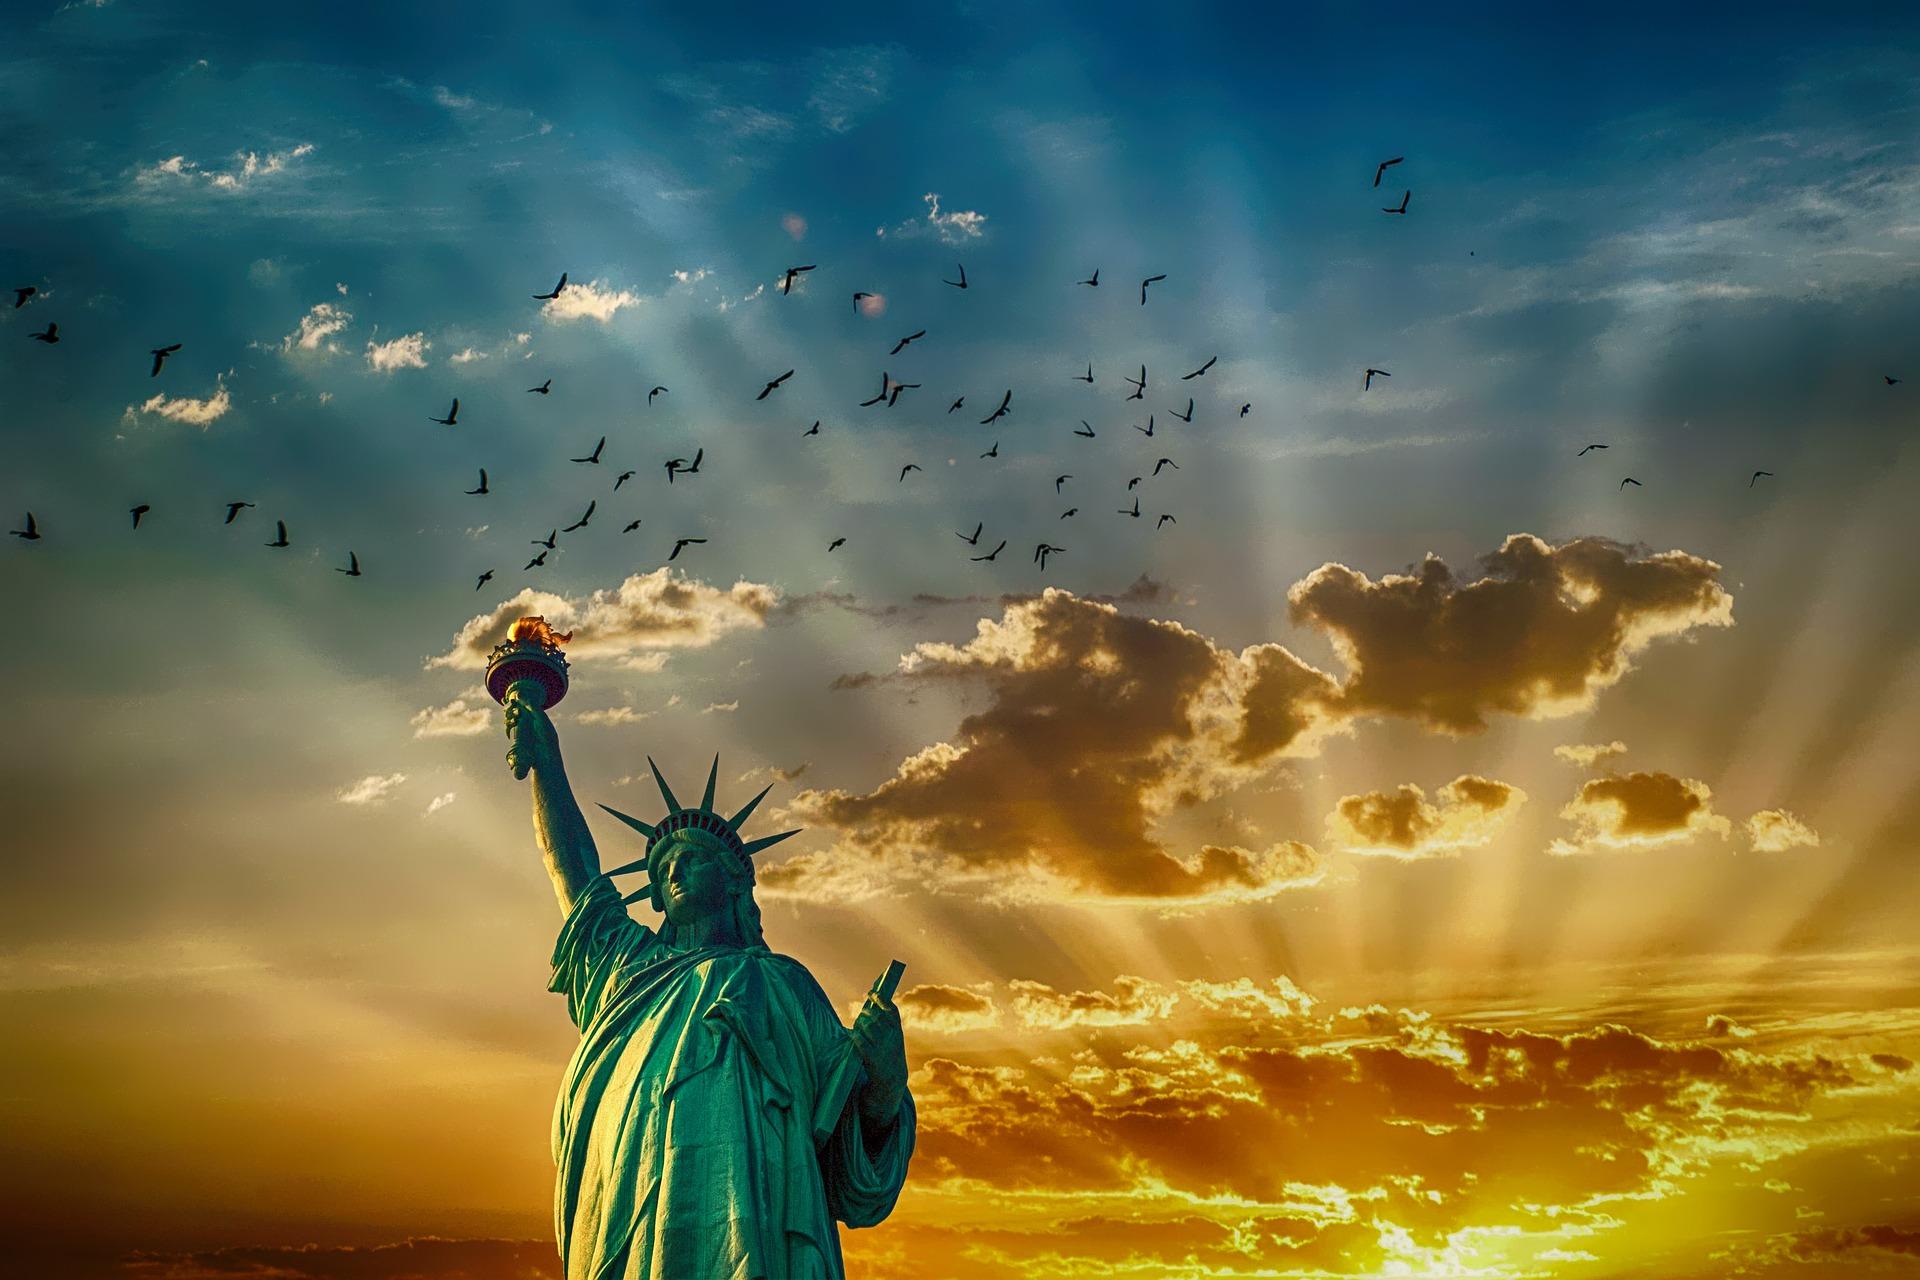 statue-of-liberty-2501264_1920.jpg